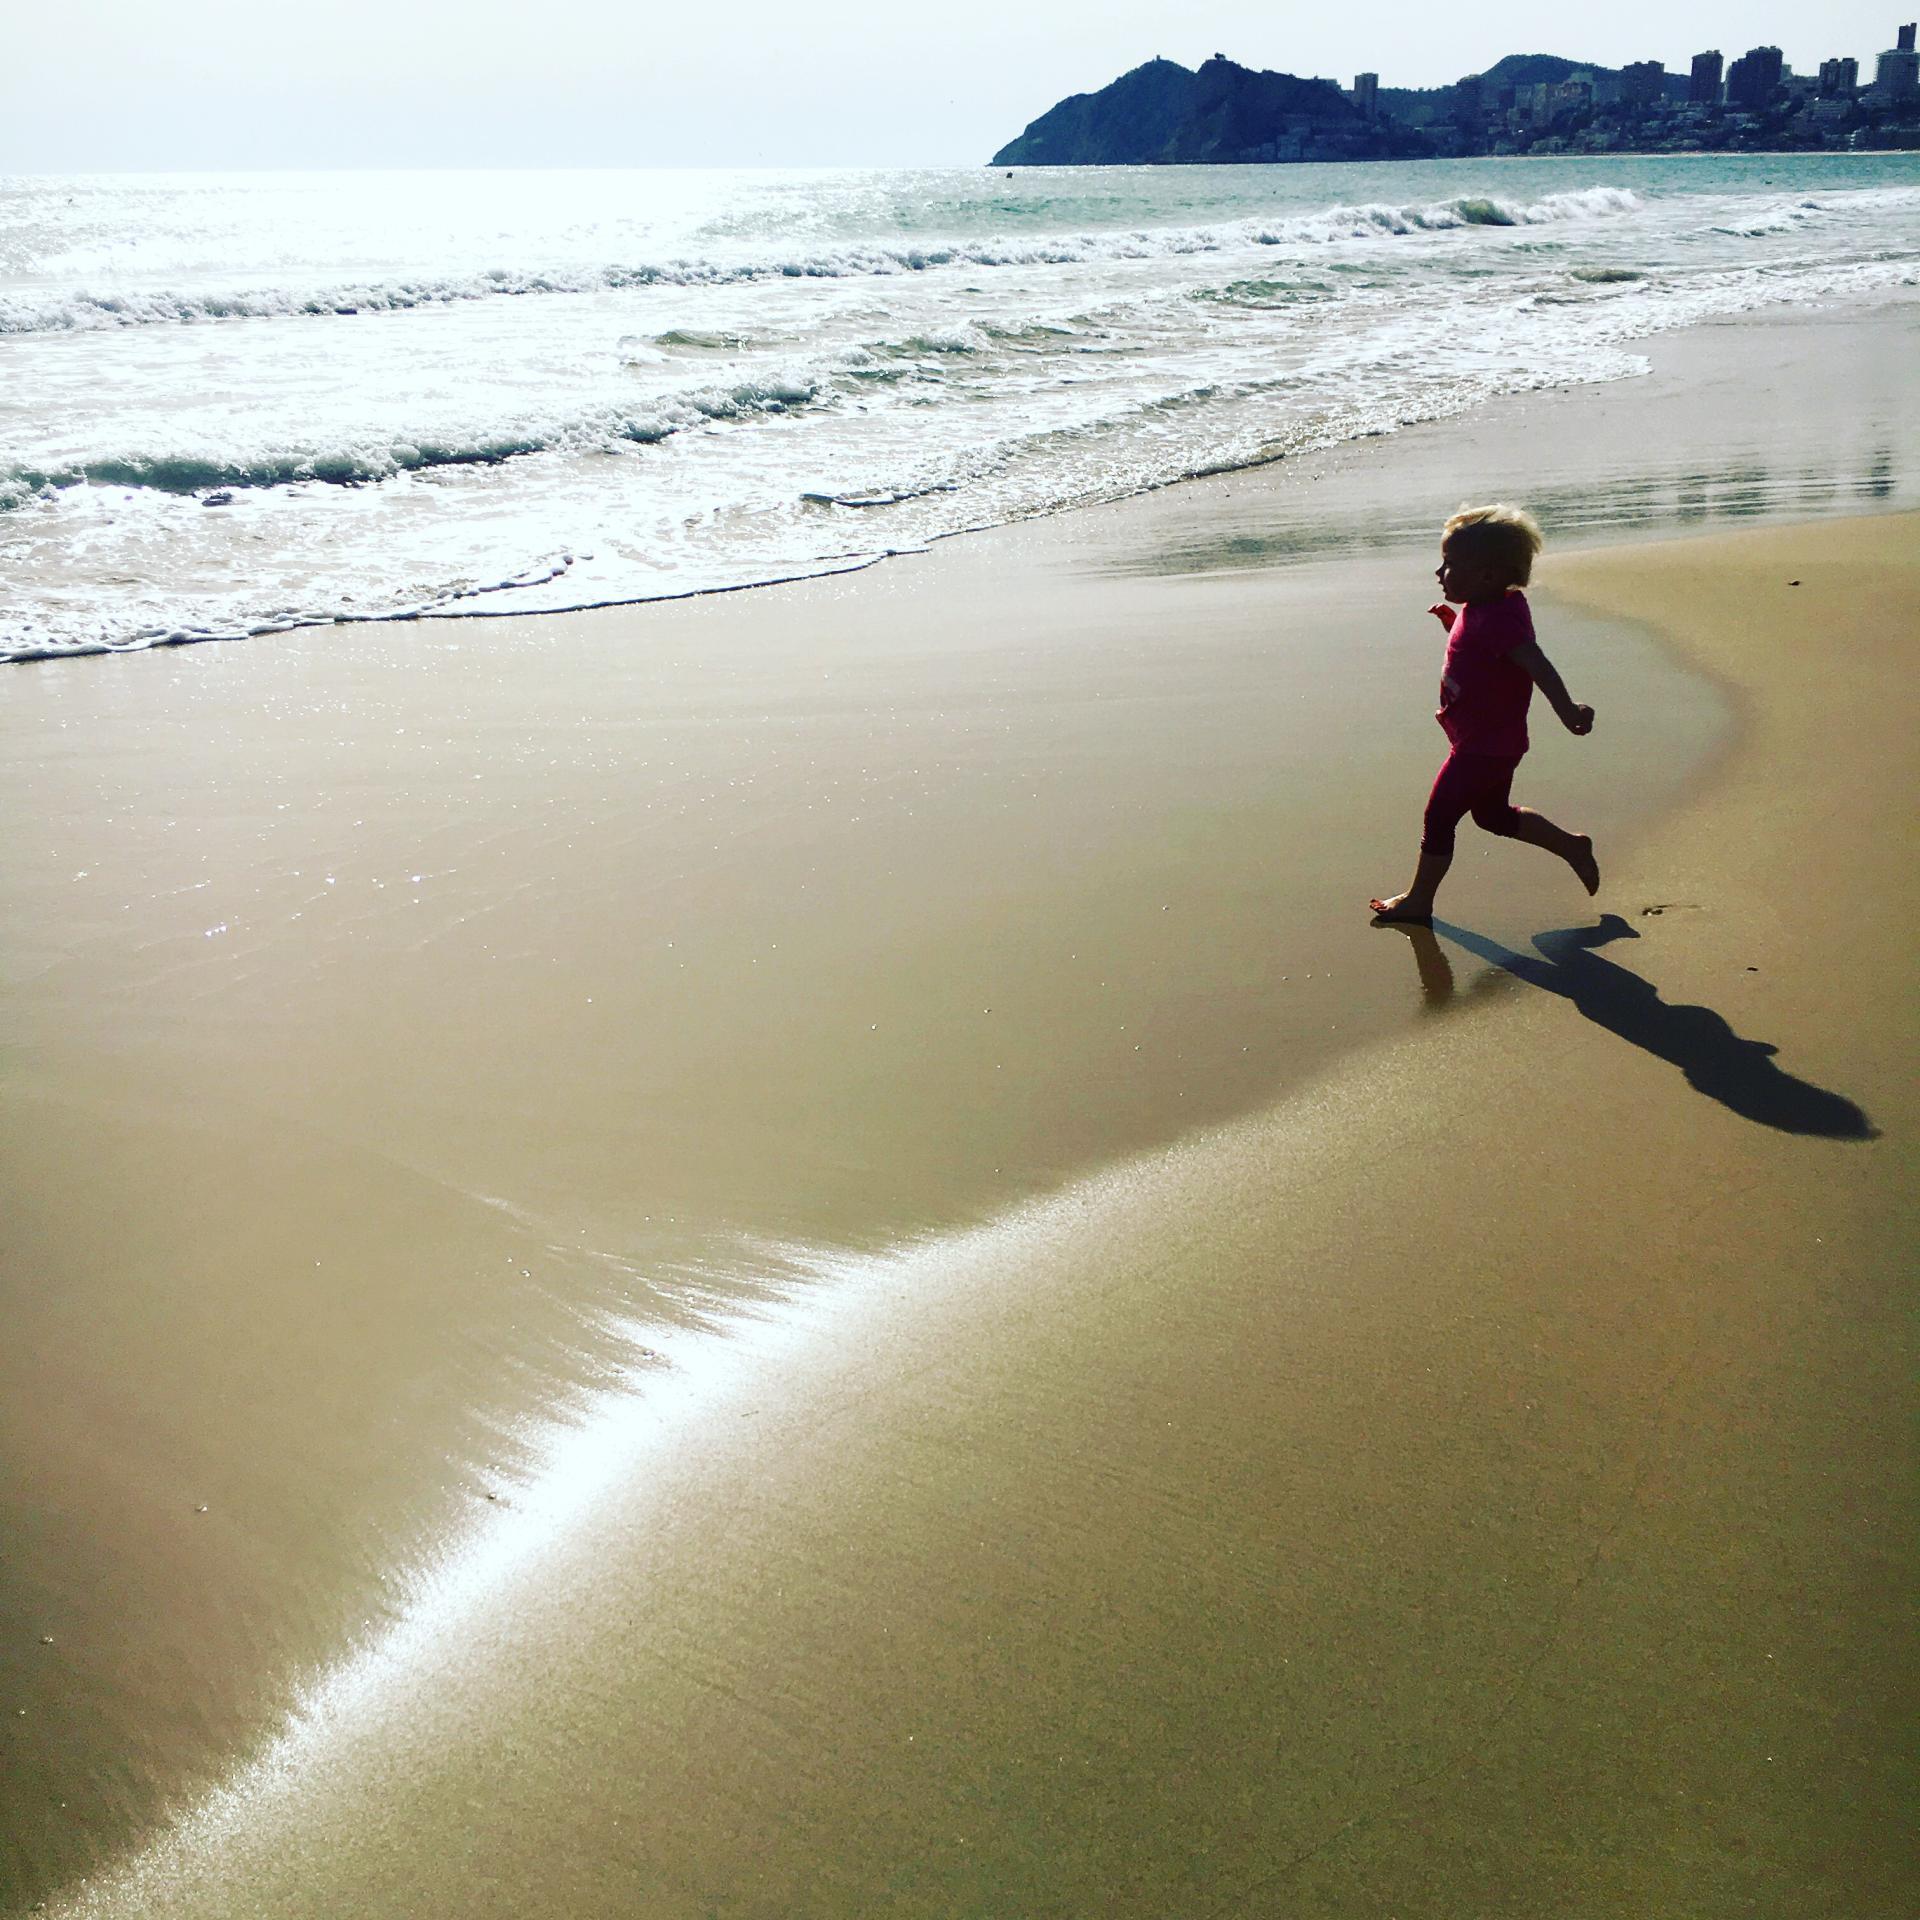 Zara on Benidorm beach